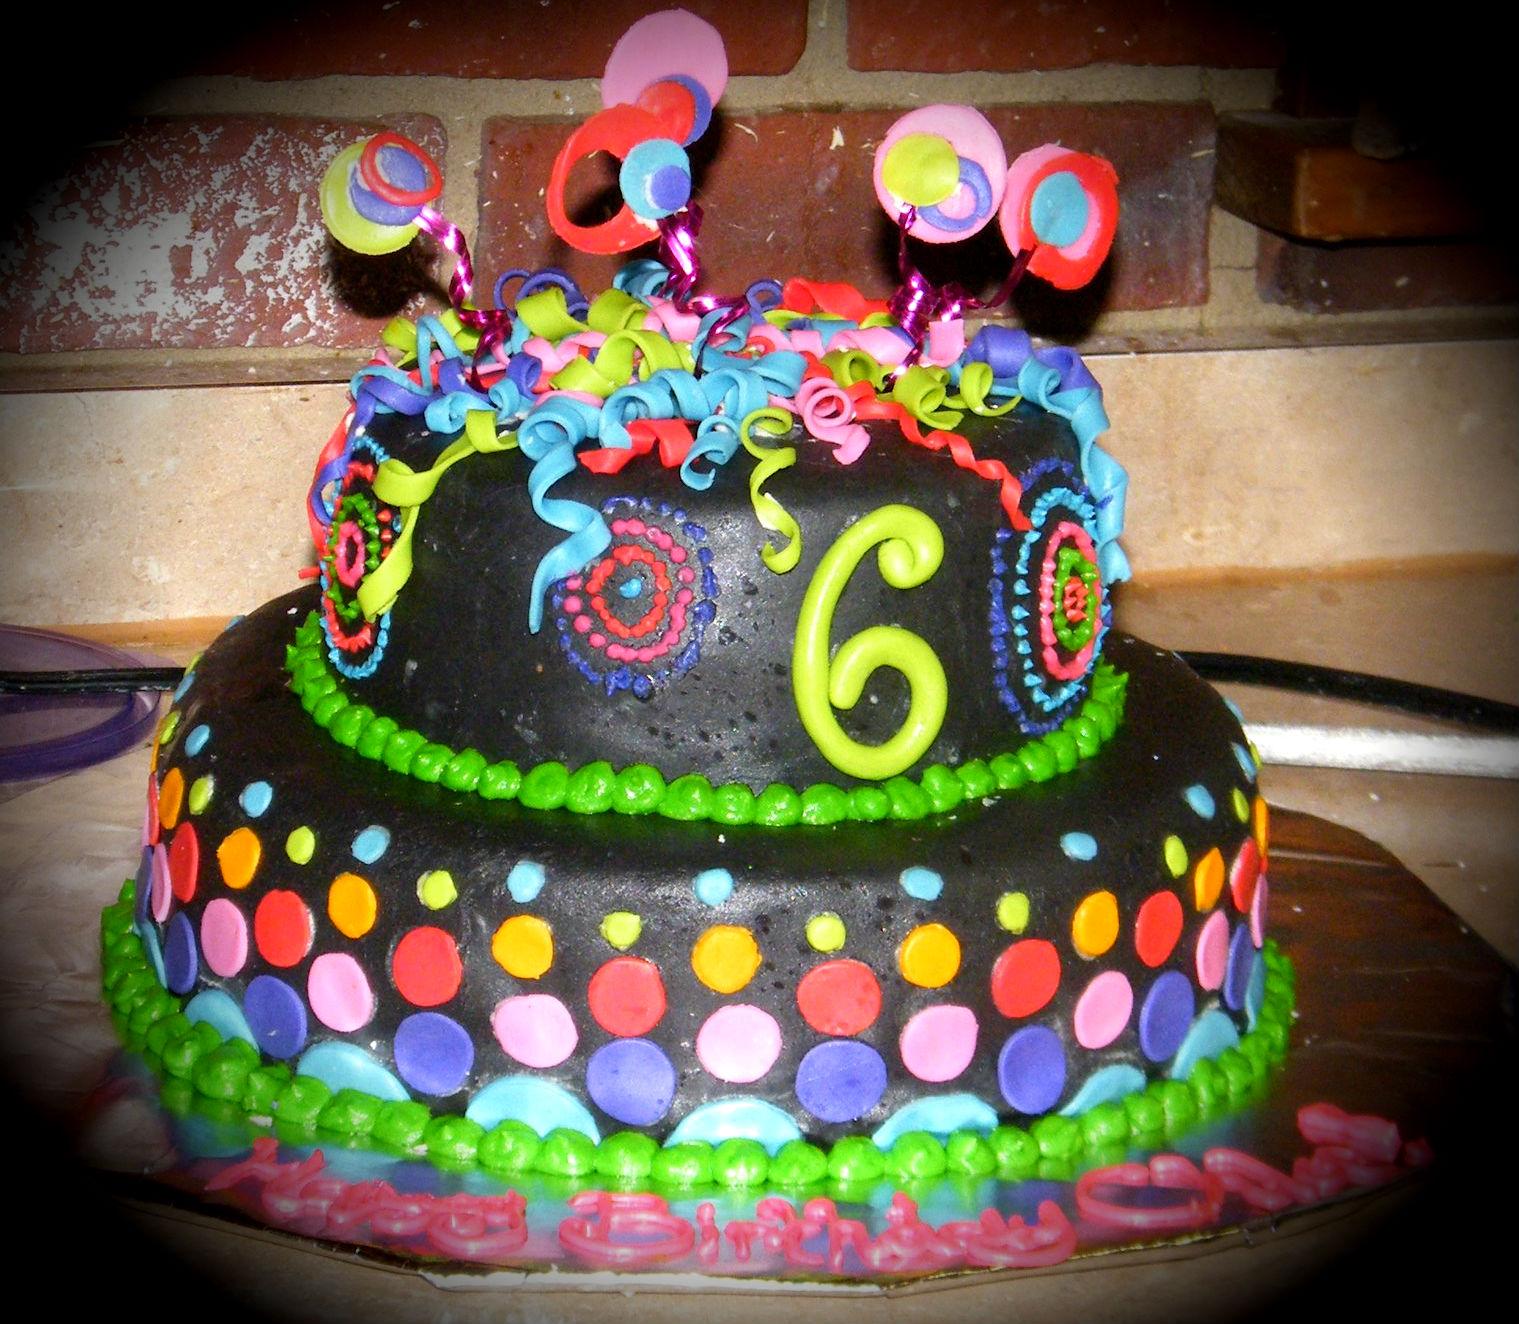 Year Birthday Cake Design